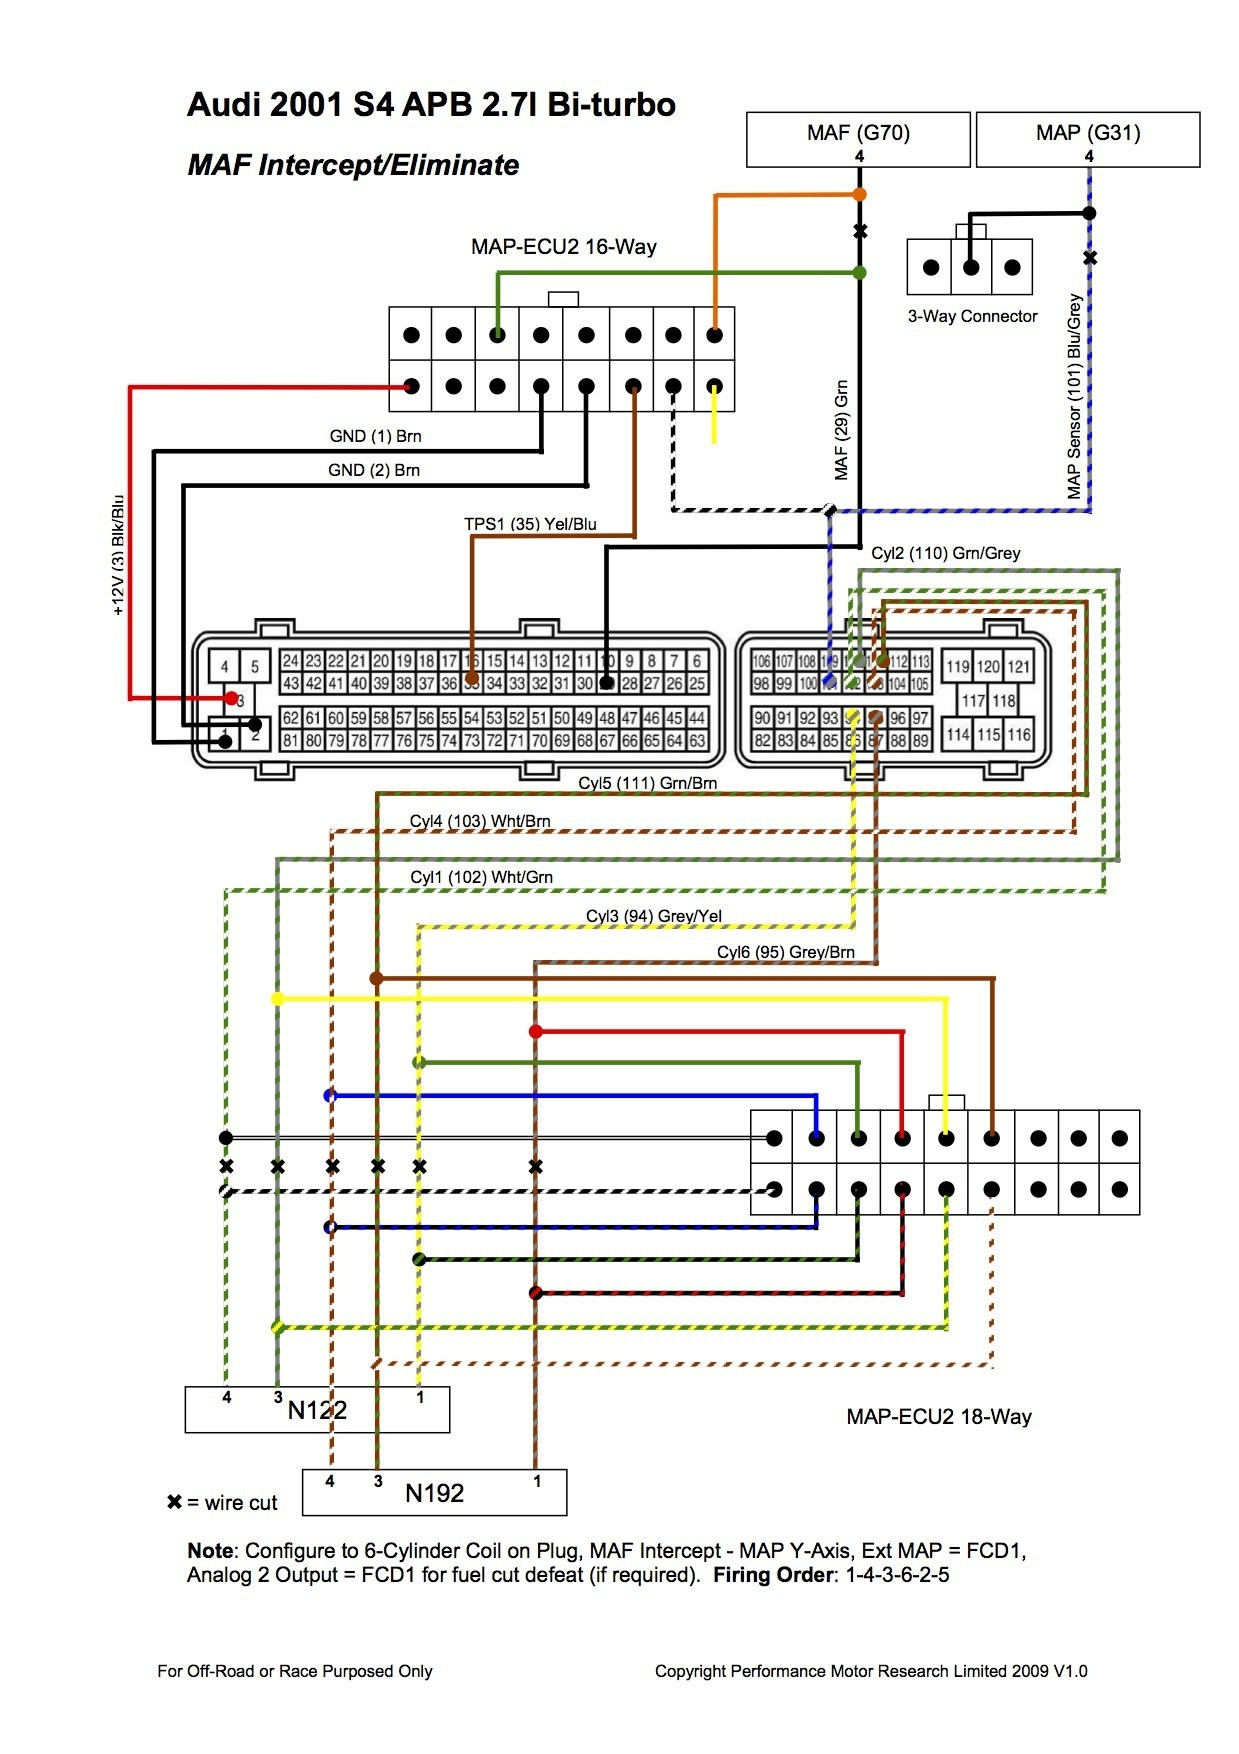 1995 dodge ram 1500 headlight wiring diagram 1995 dodge ram wiring diagram wiring diagram data  1995 dodge ram wiring diagram wiring